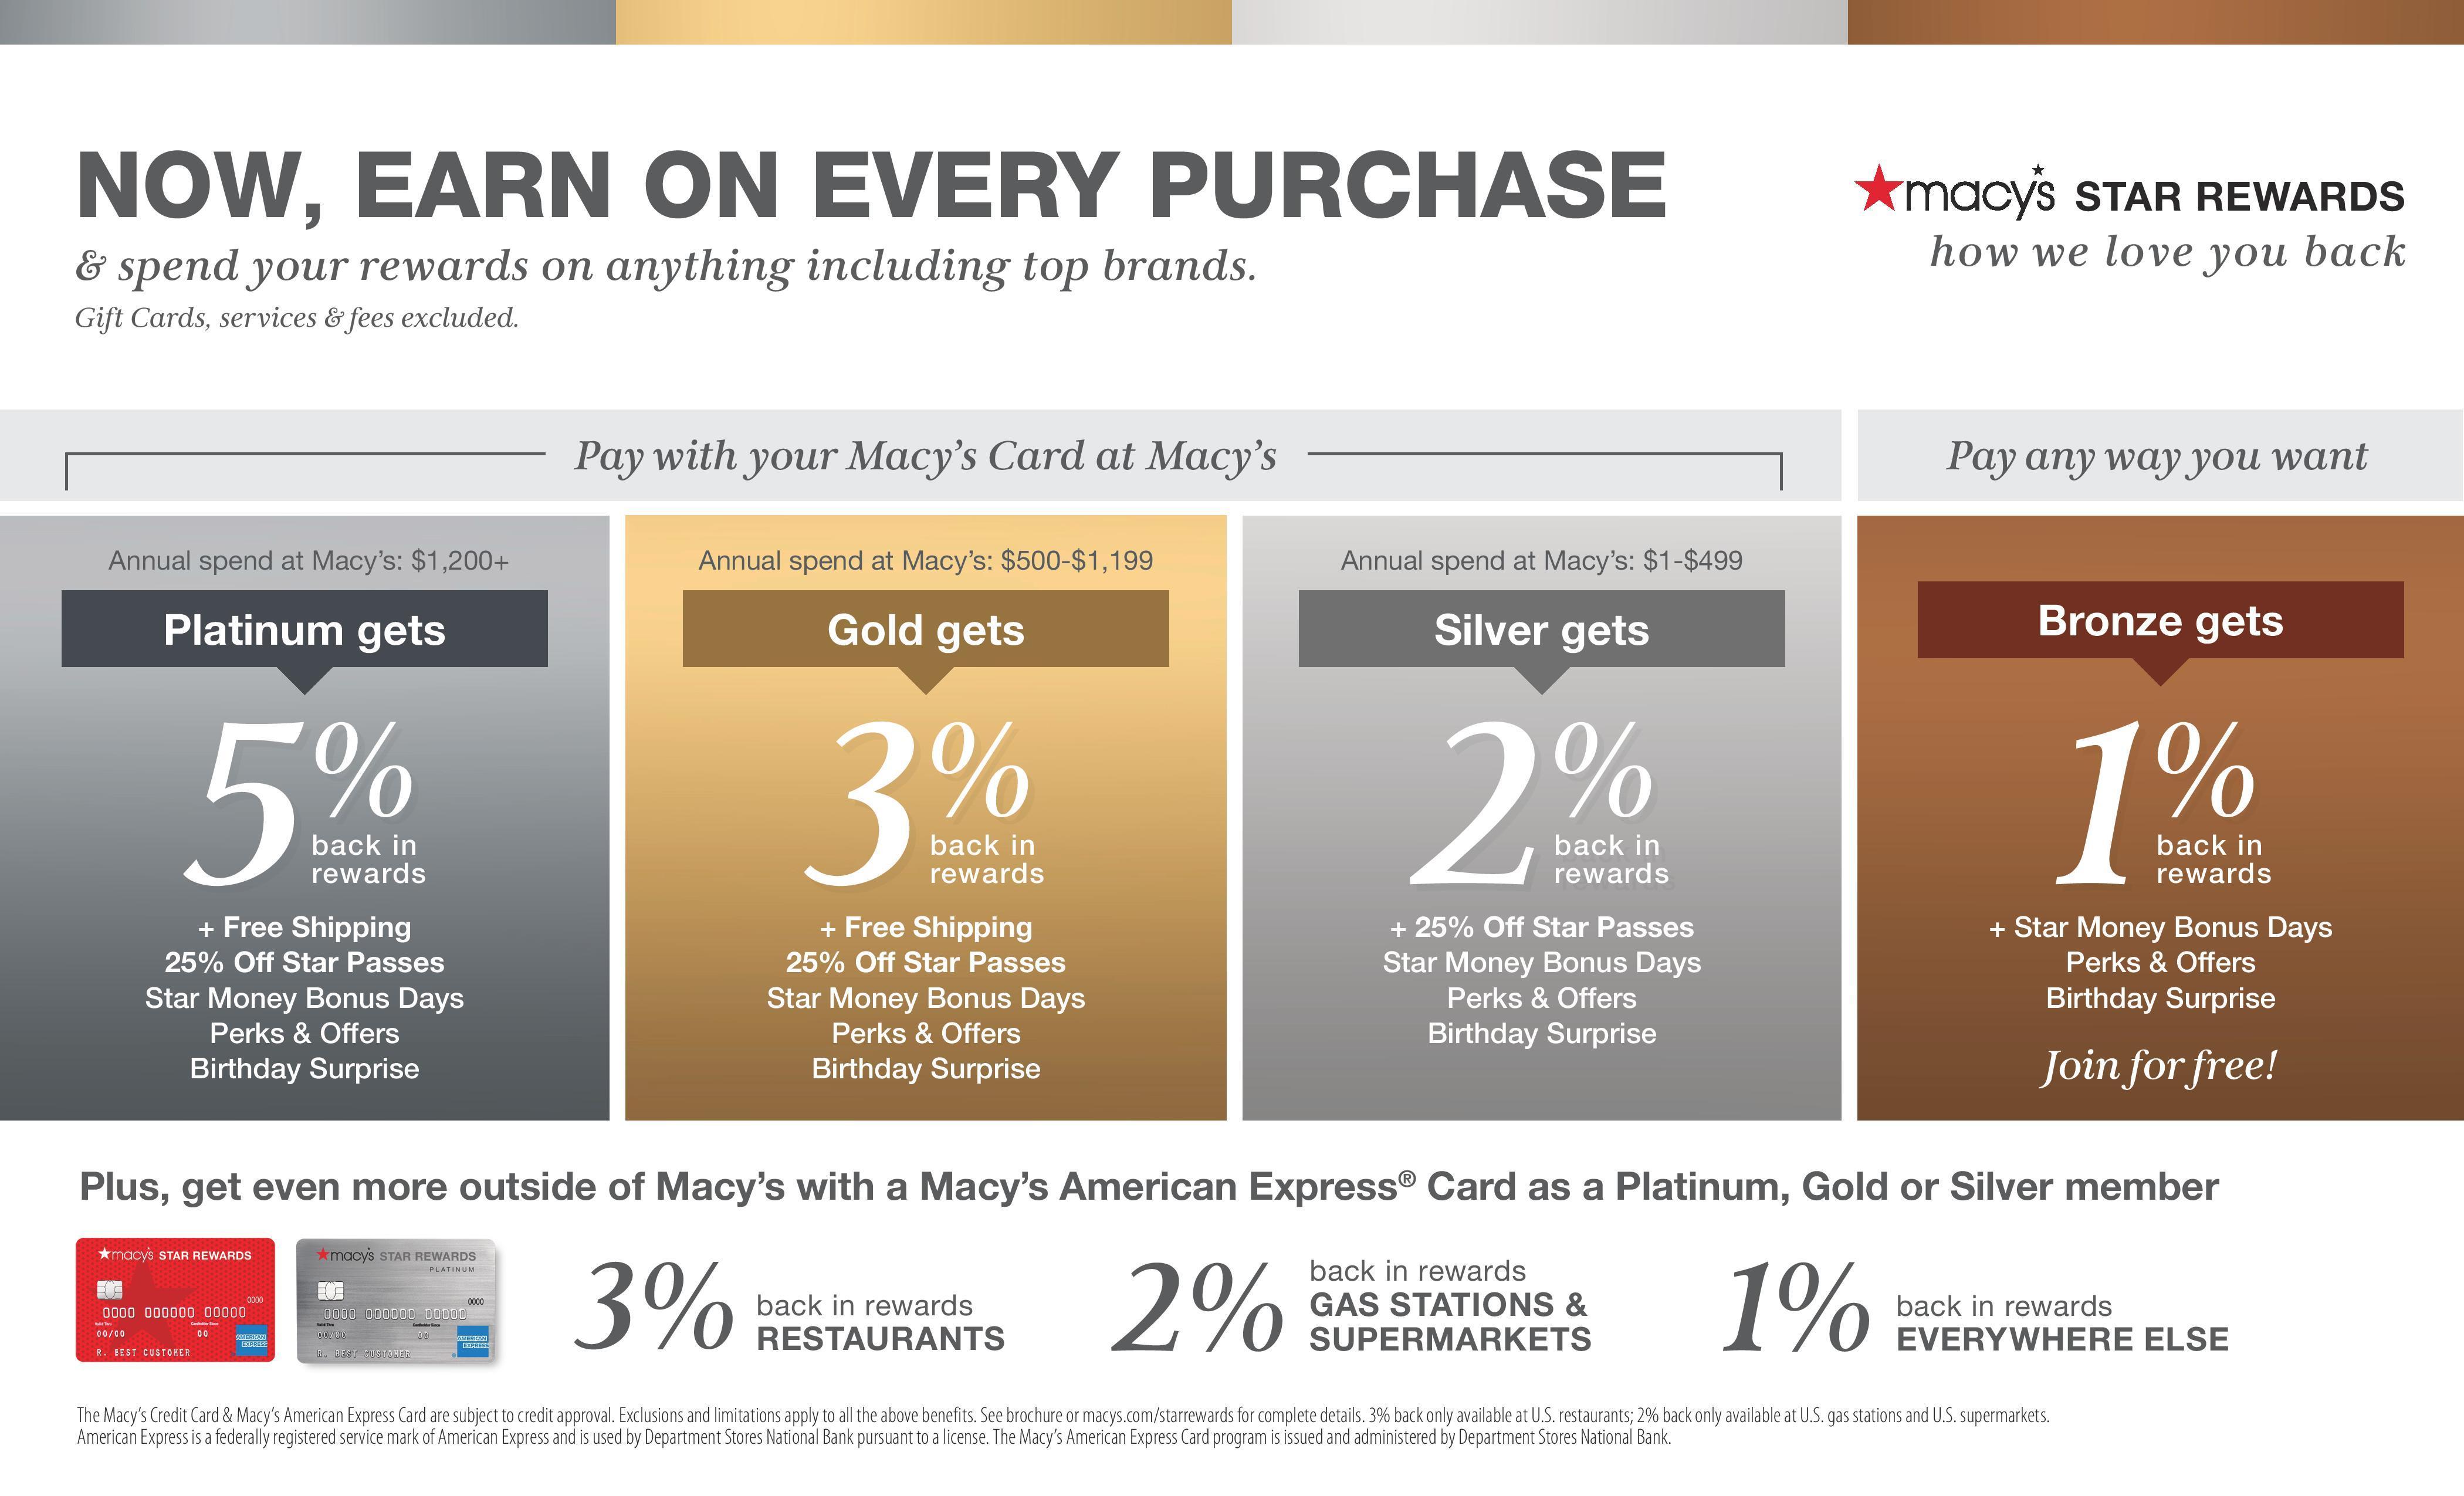 Macy's Loyalty Program Rules